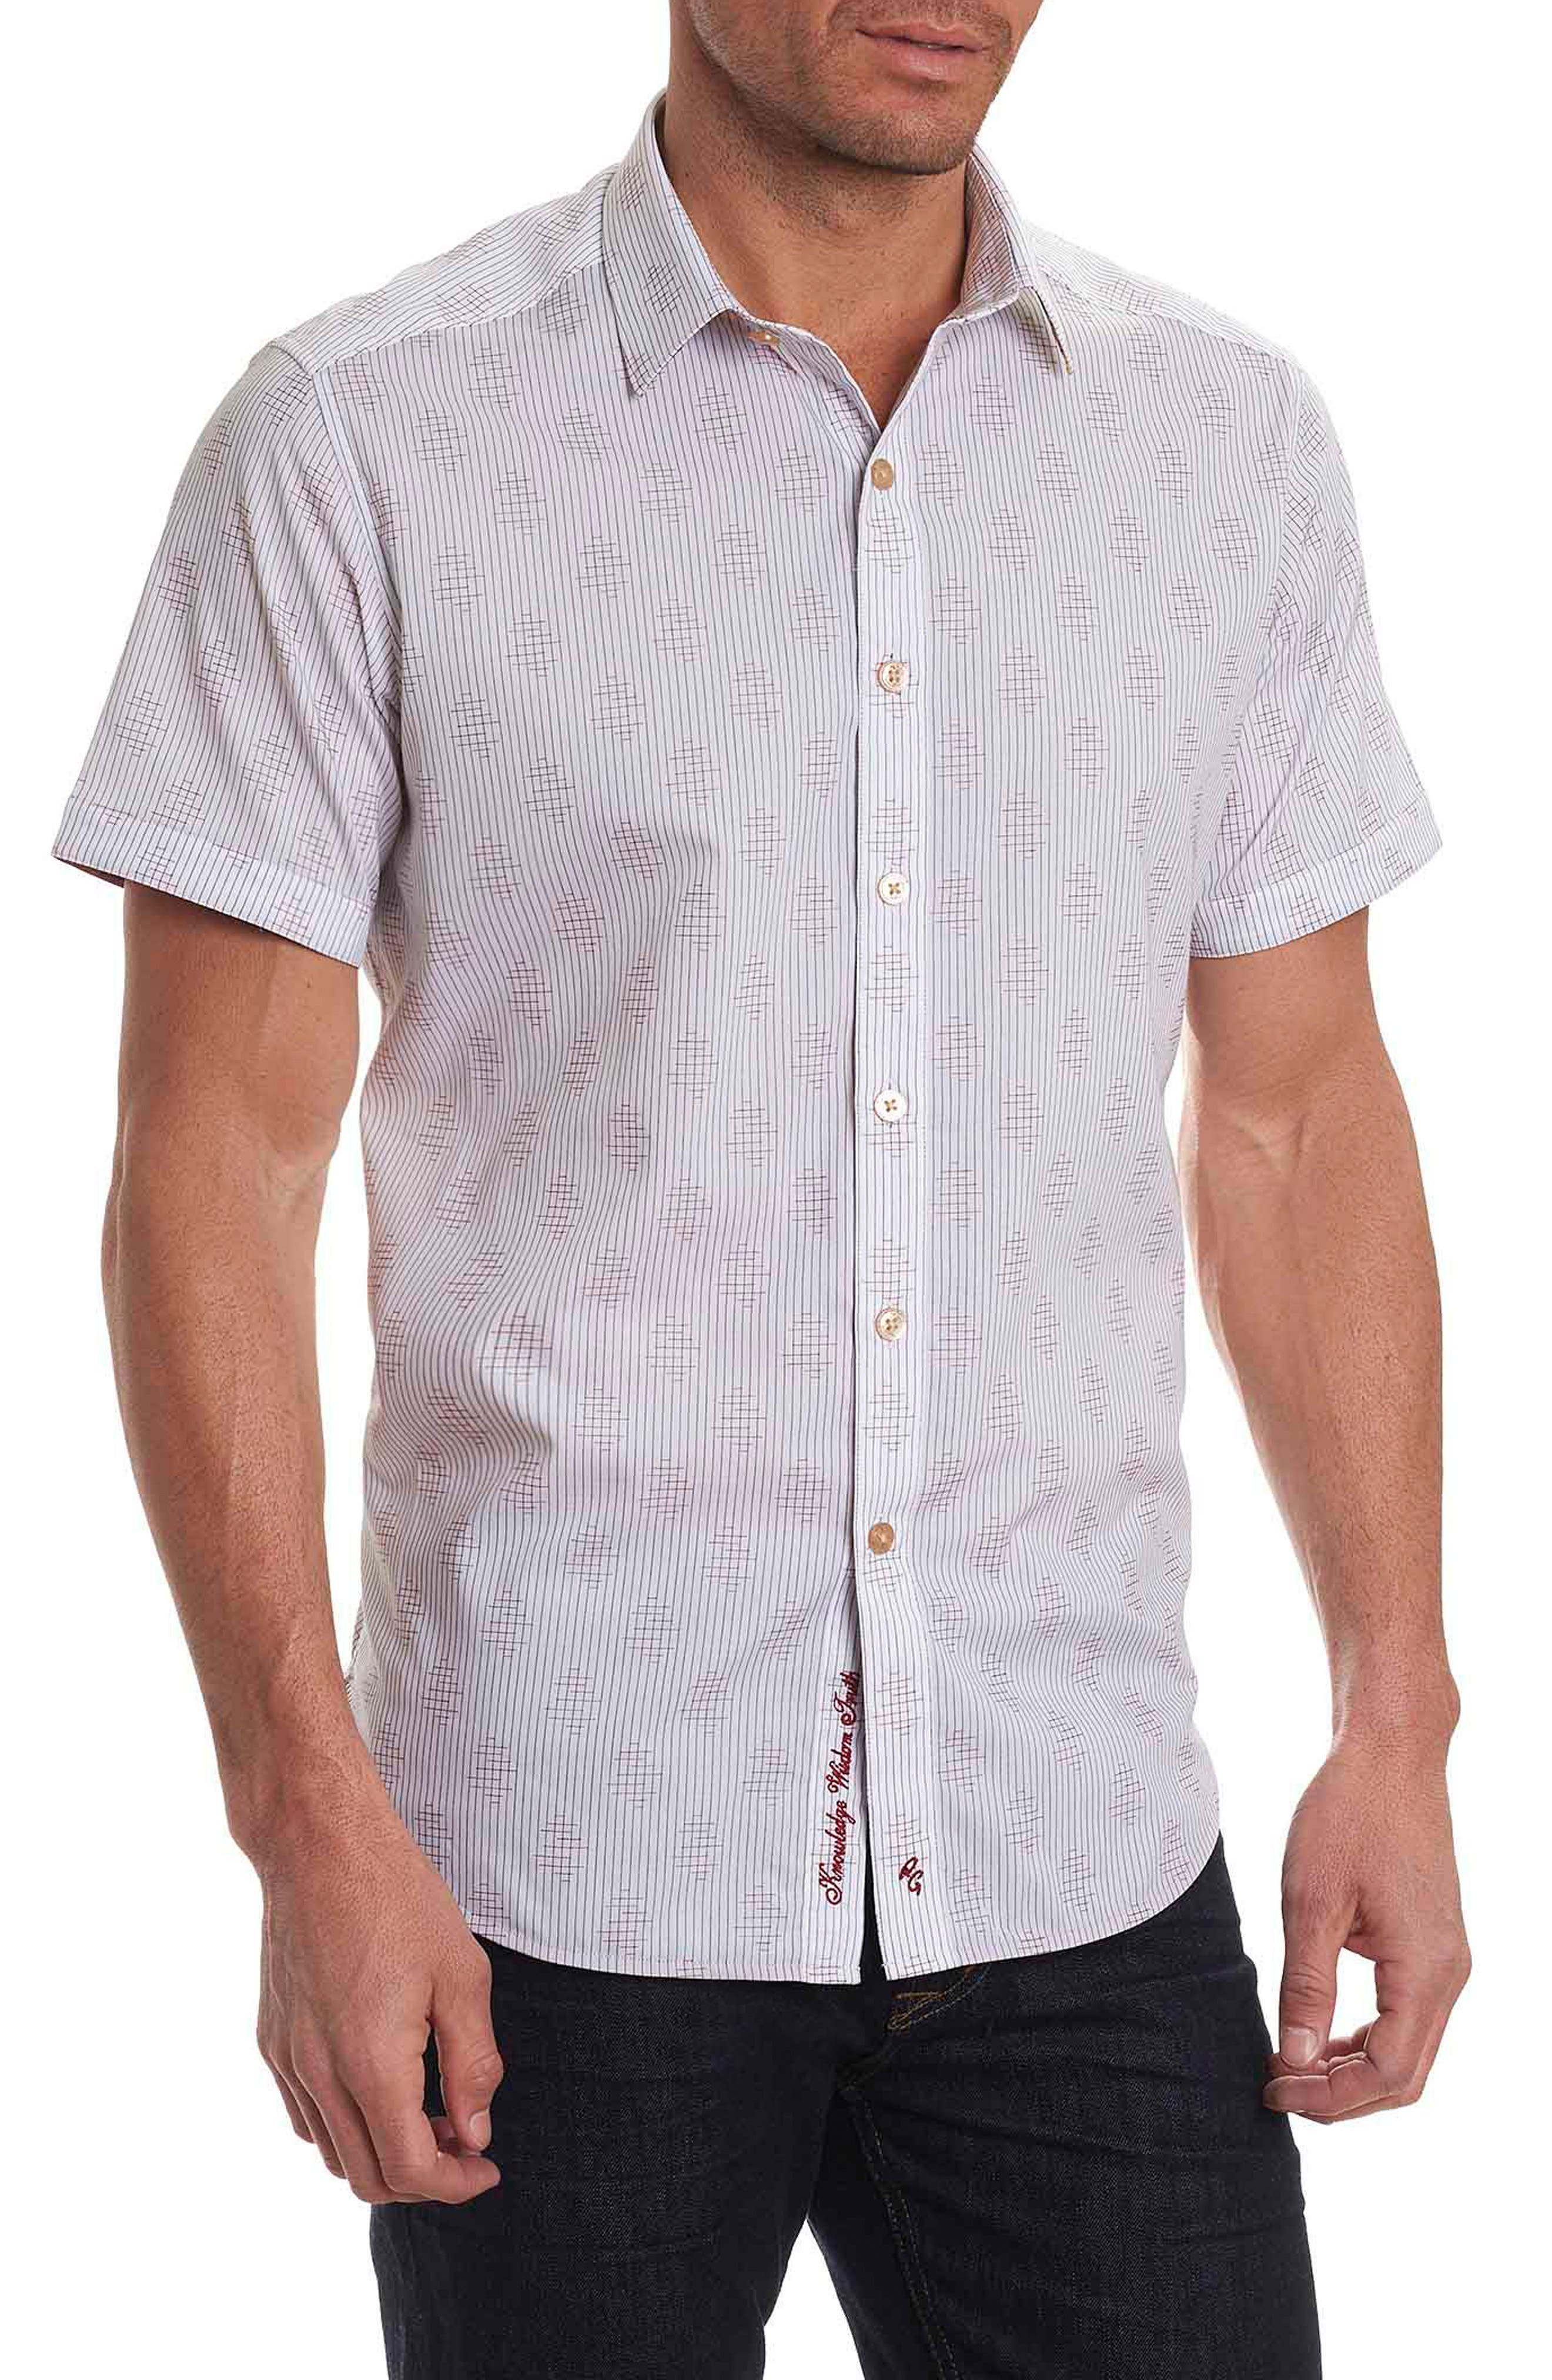 Main Image - Robert Graham Linden Stripe Short Sleeve Sport Shirt